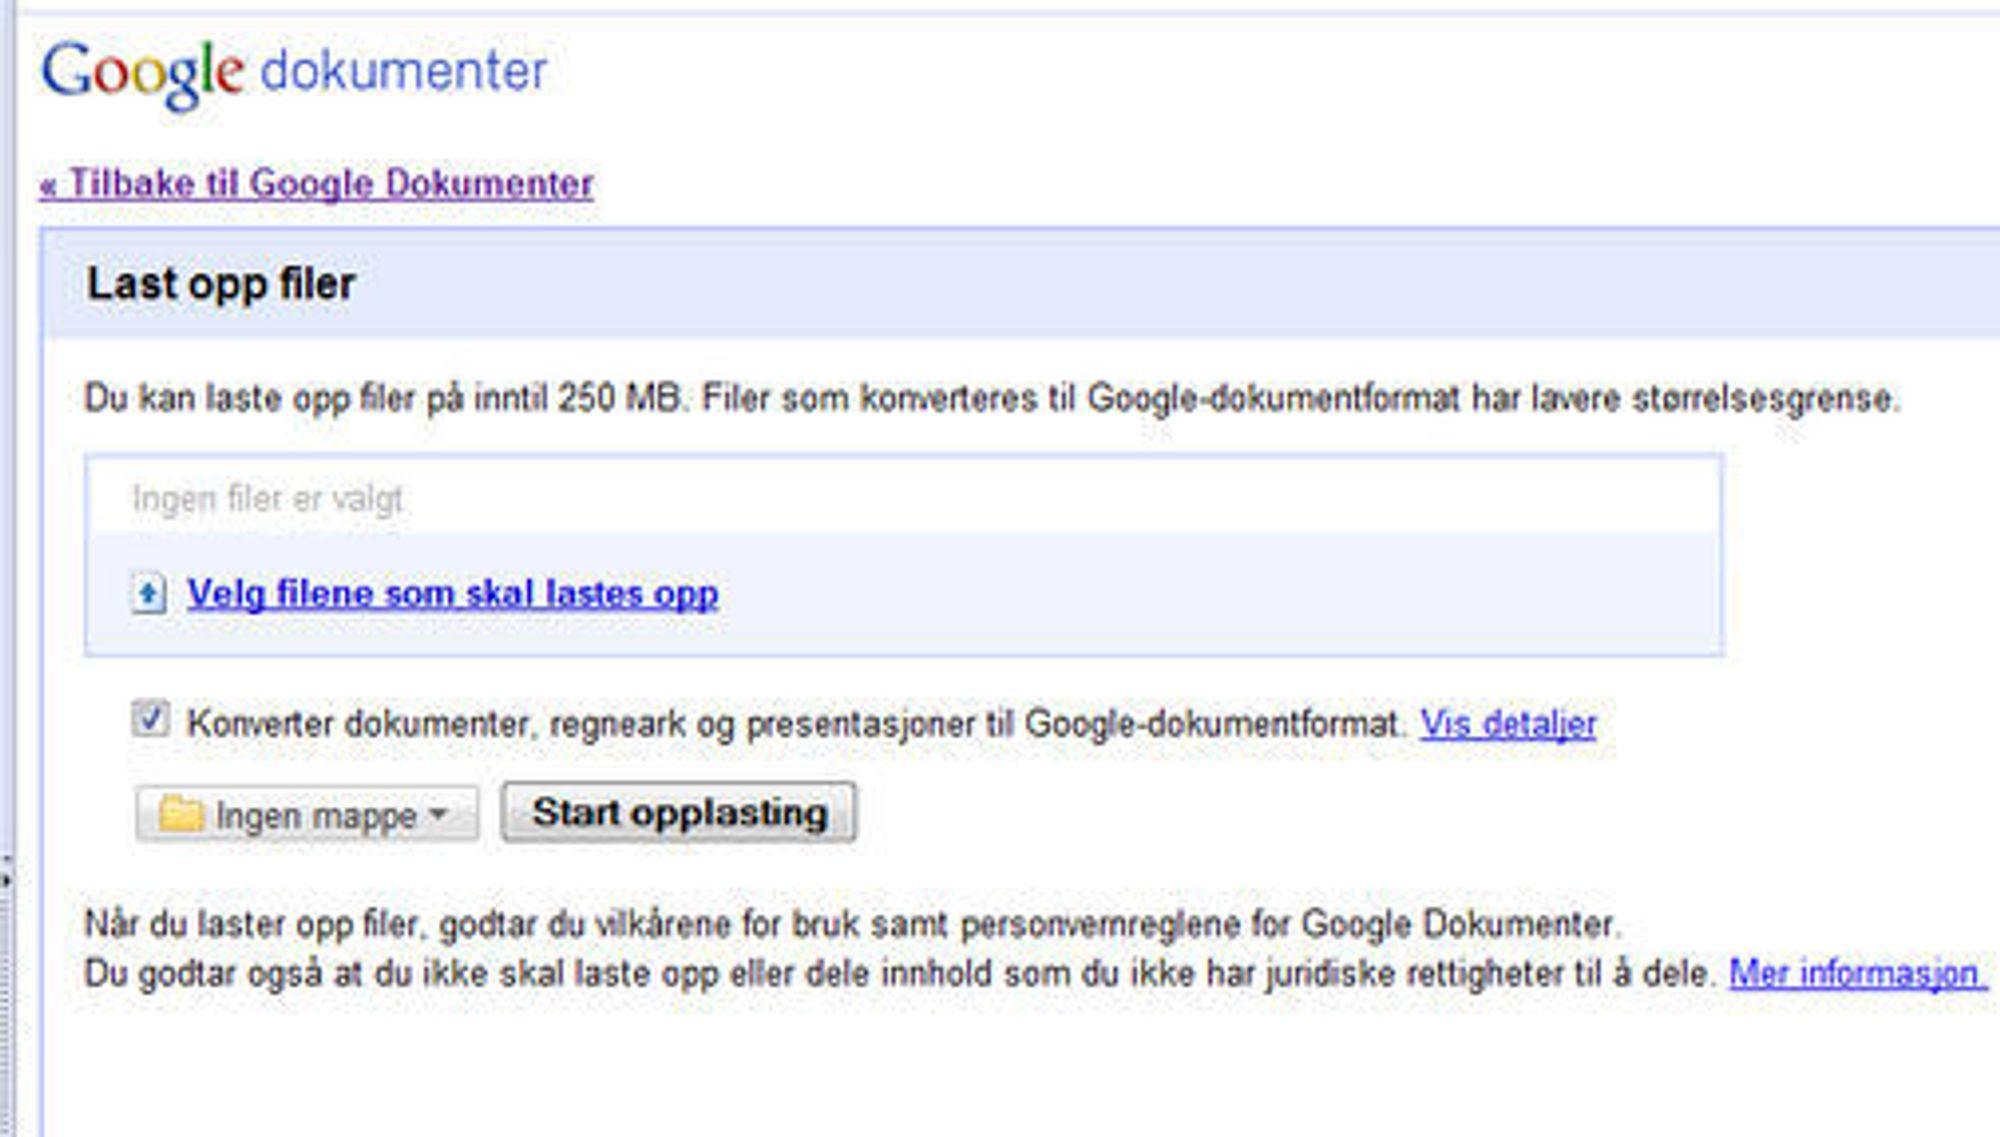 Filopplasting i Google Docs.